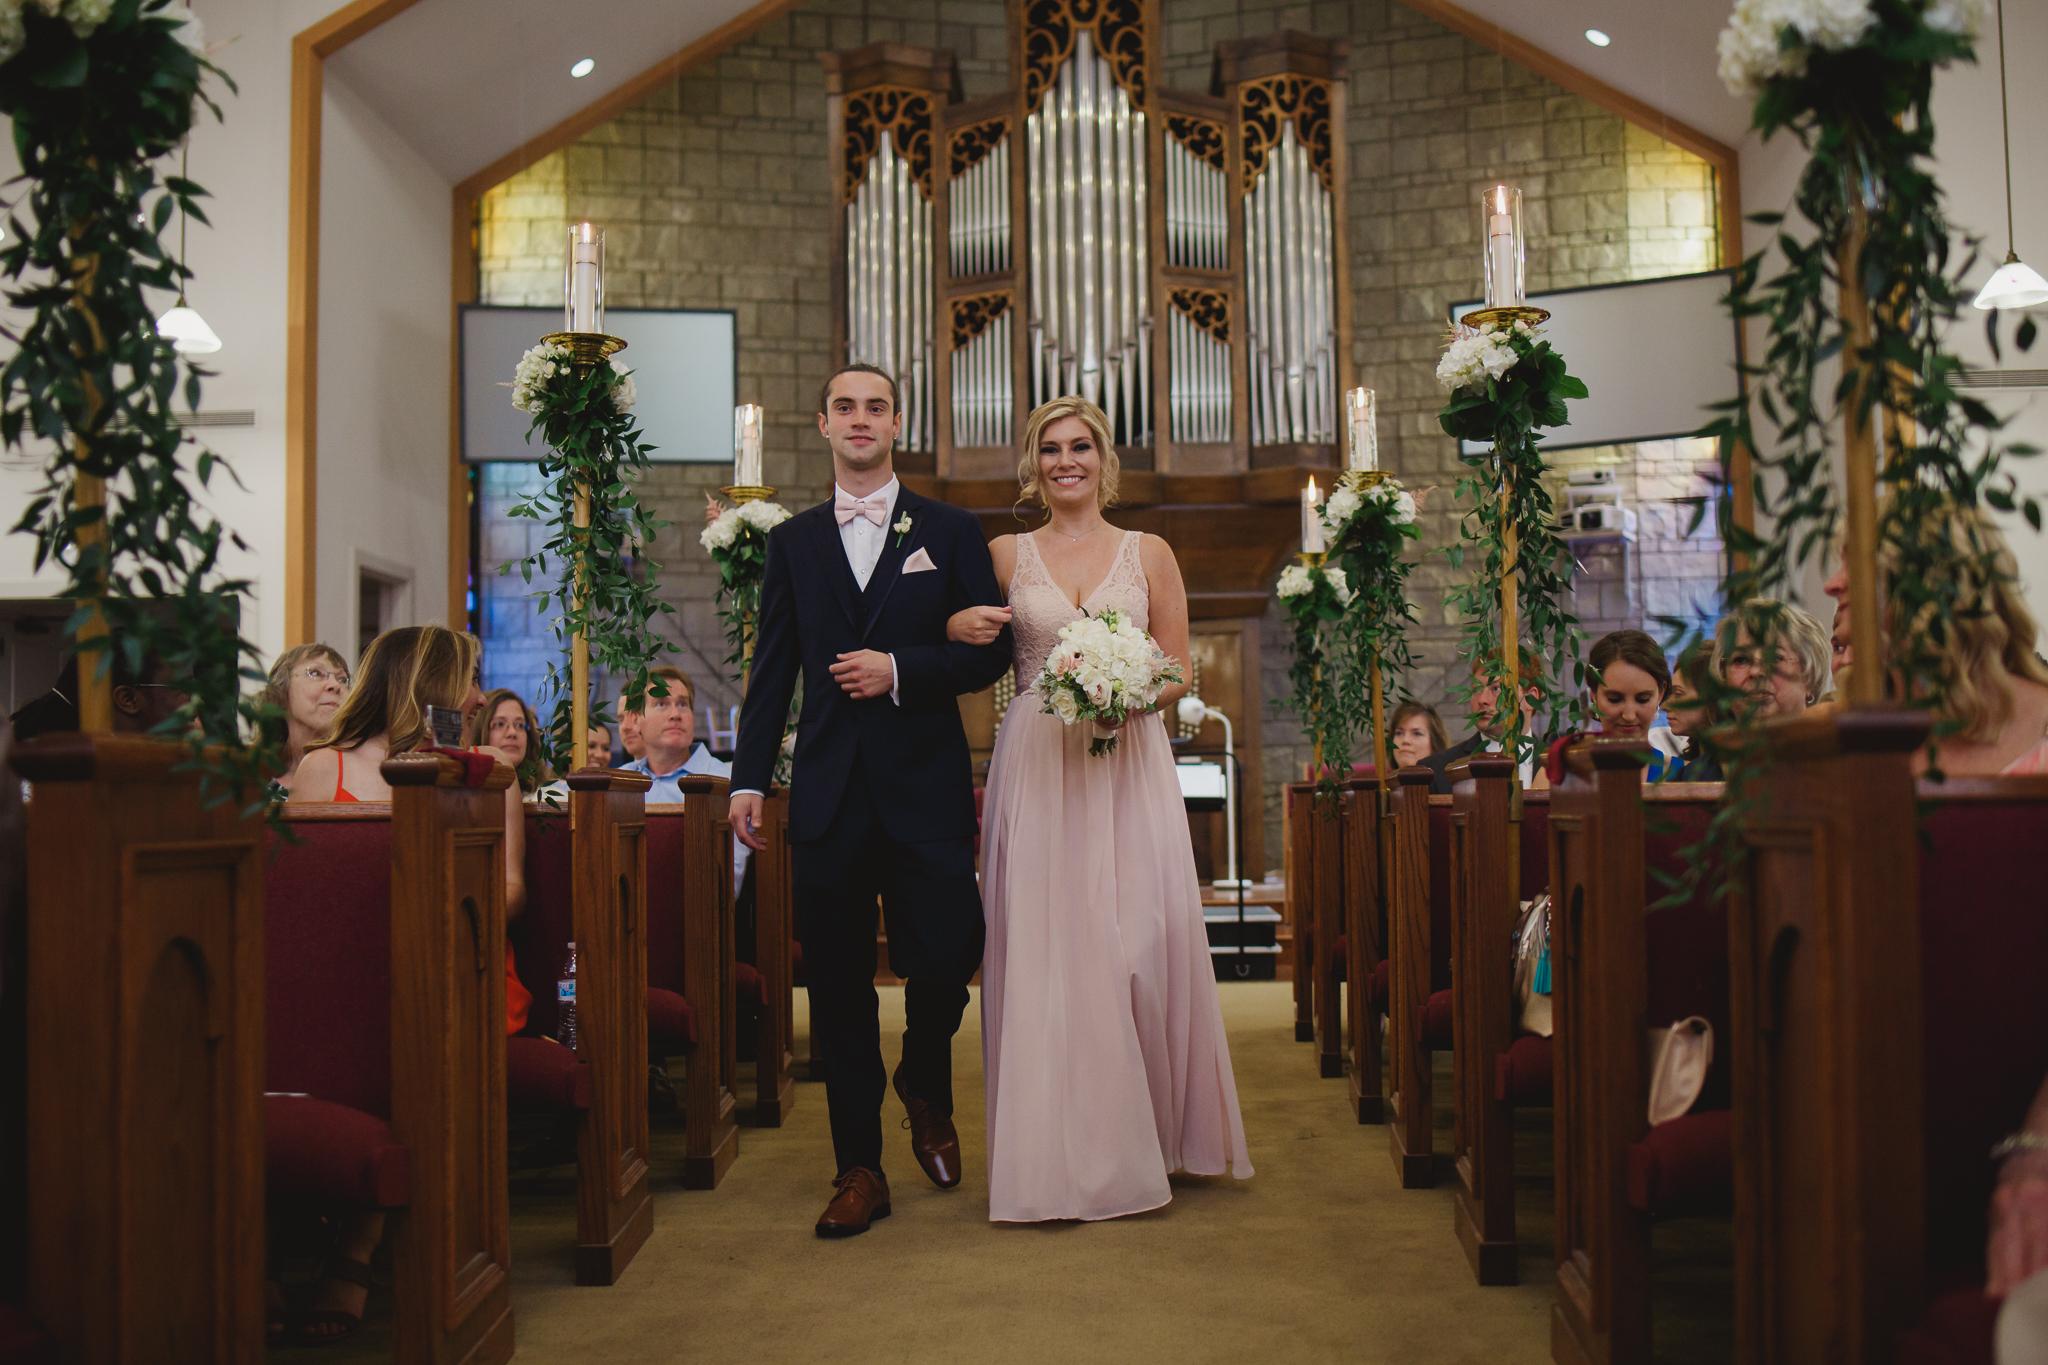 Michael and Kelly - the ashton depot - wedding DFW - wedding photographer- elizalde photography (23 of 150).jpg